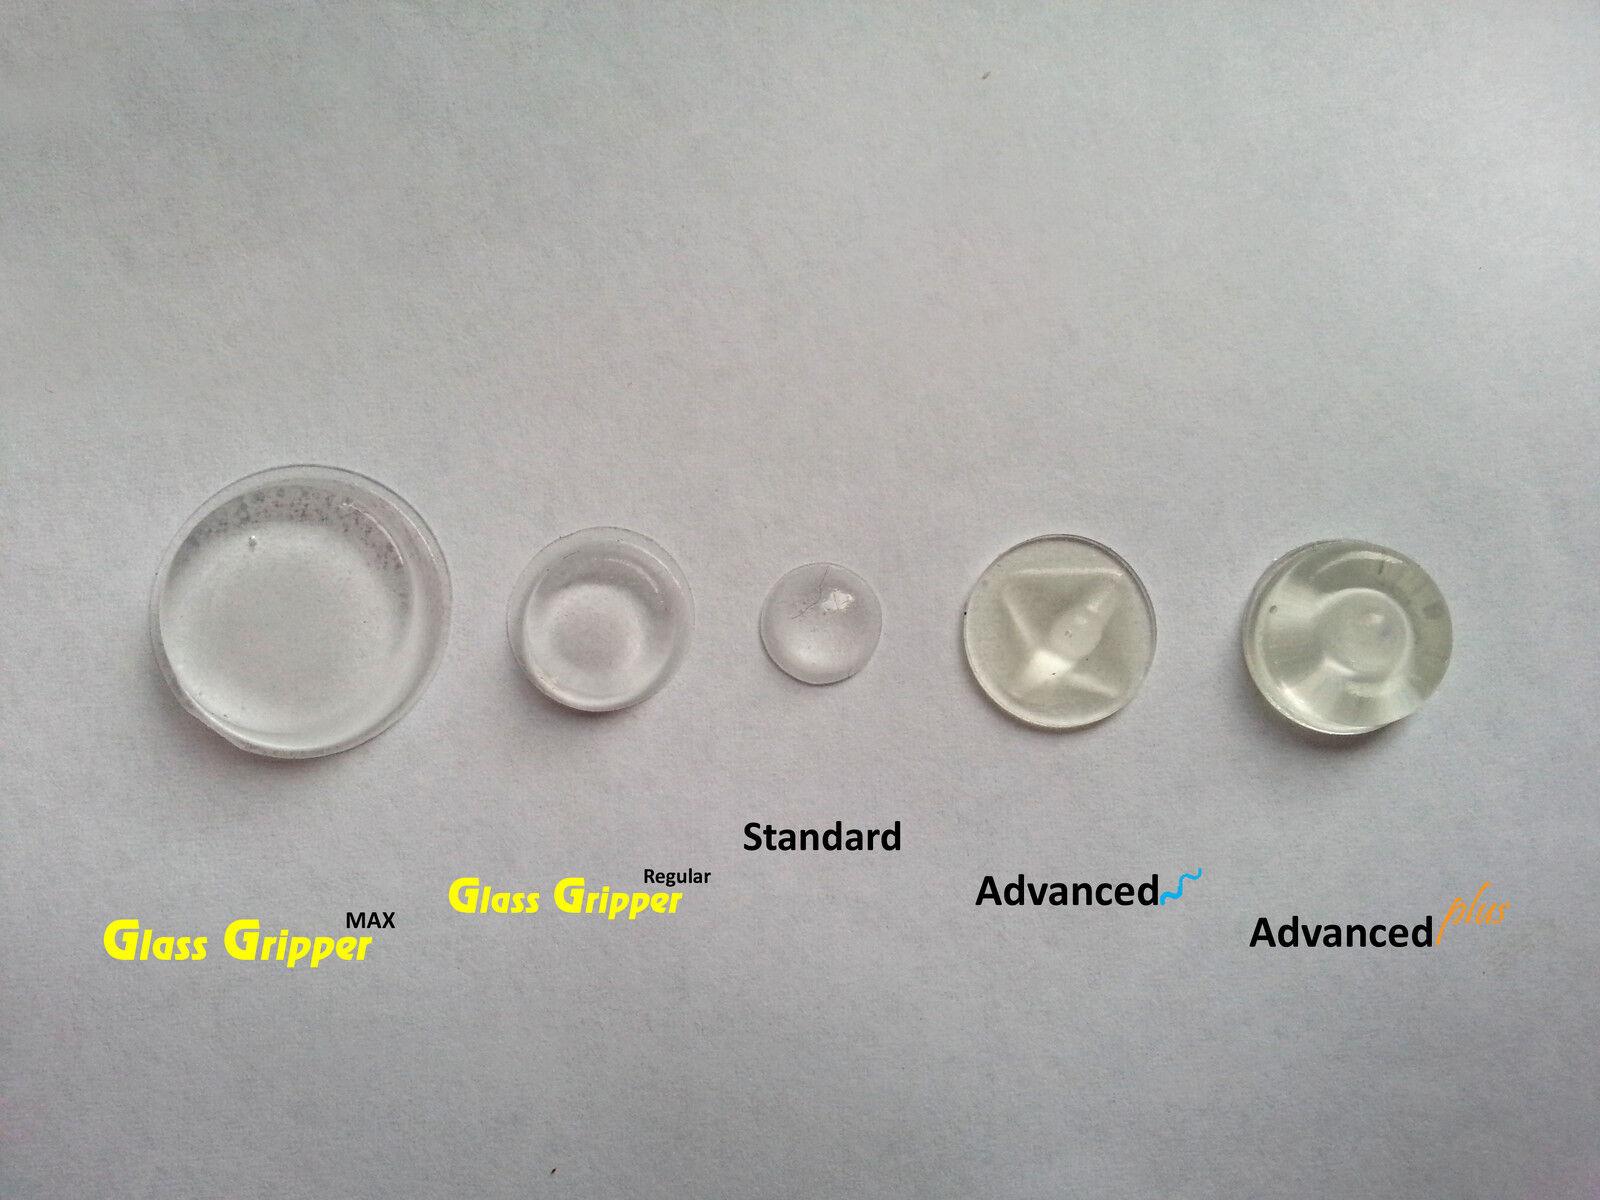 Self Adhesive Polyurethane Rubber Bumper Feet Stops